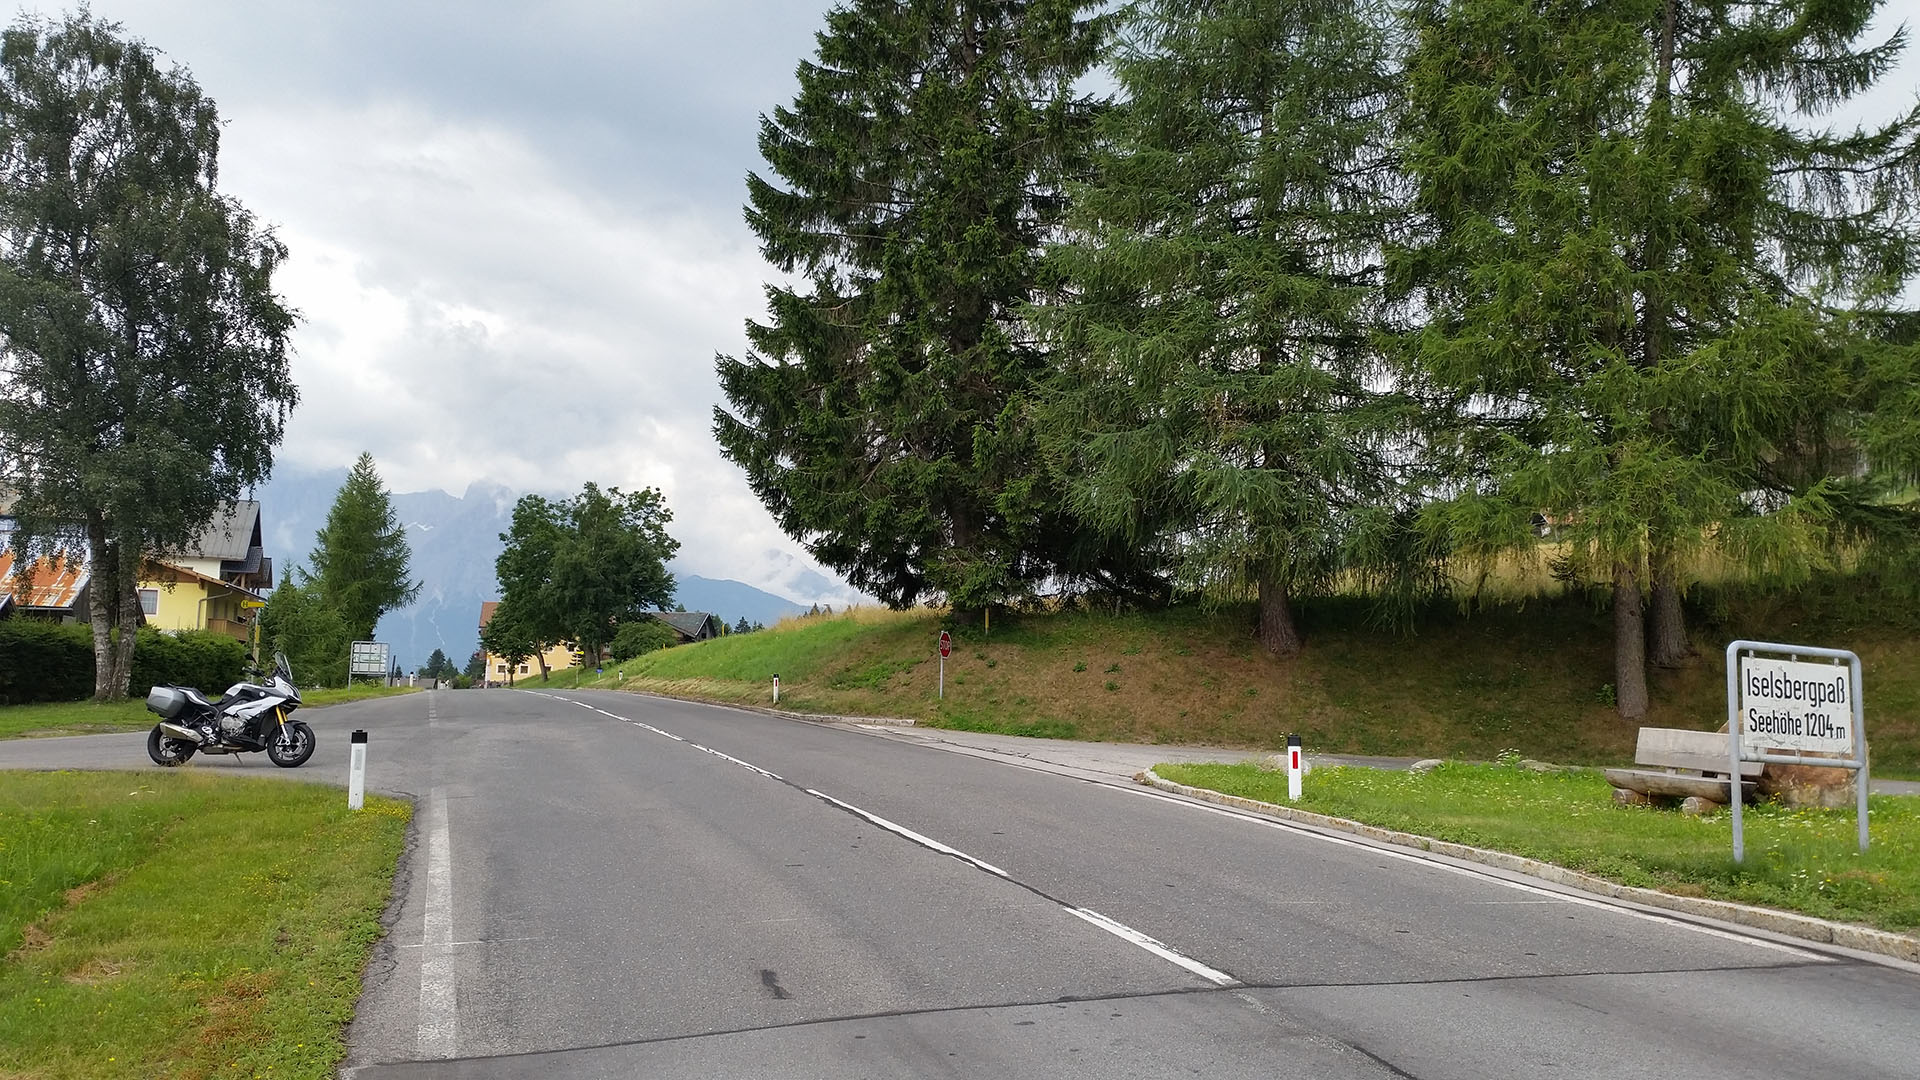 1204 - A - Iselsberg-Pass